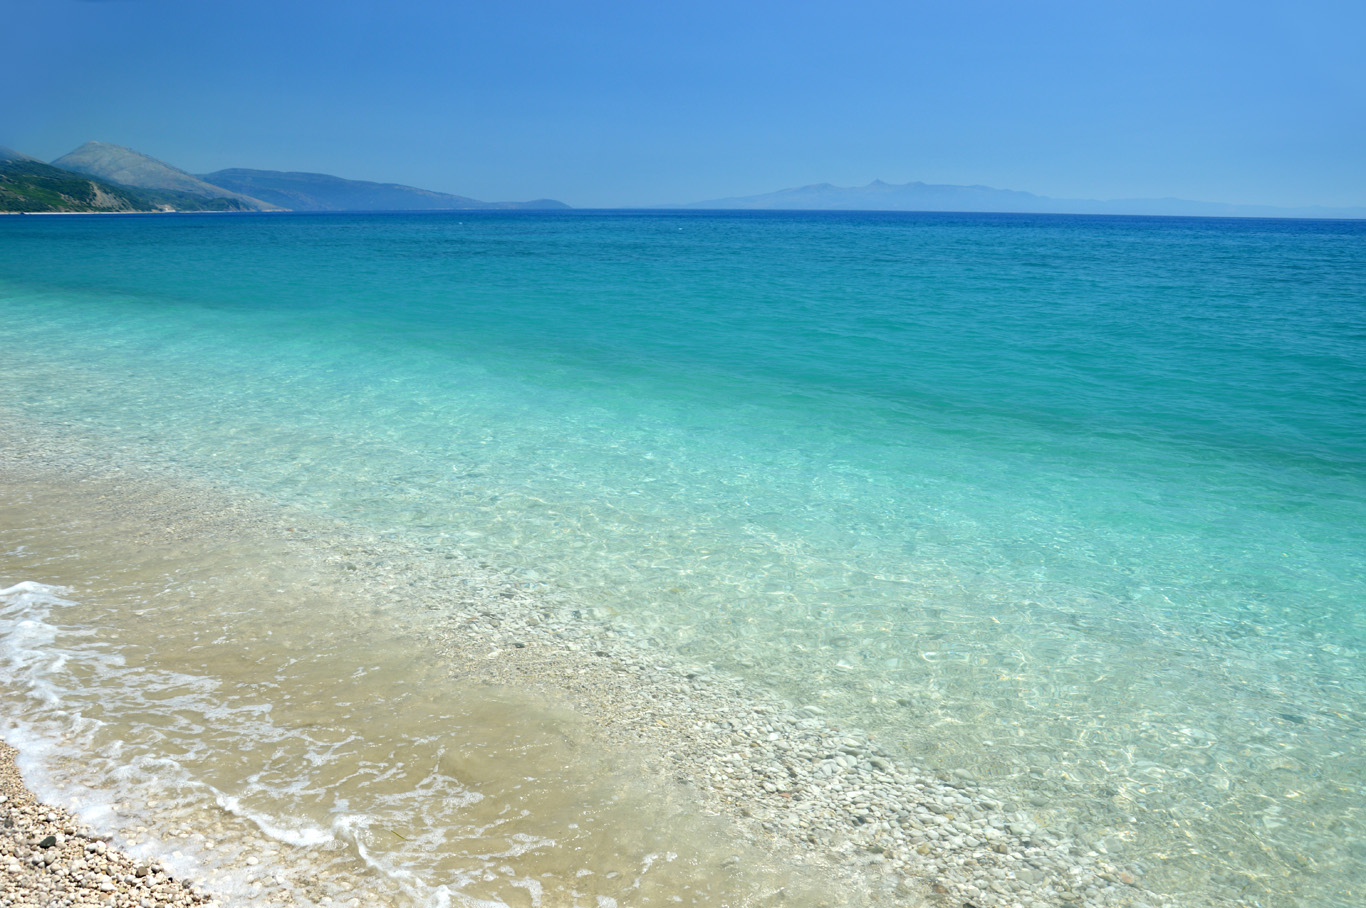 Crystal clear sea in Borsh